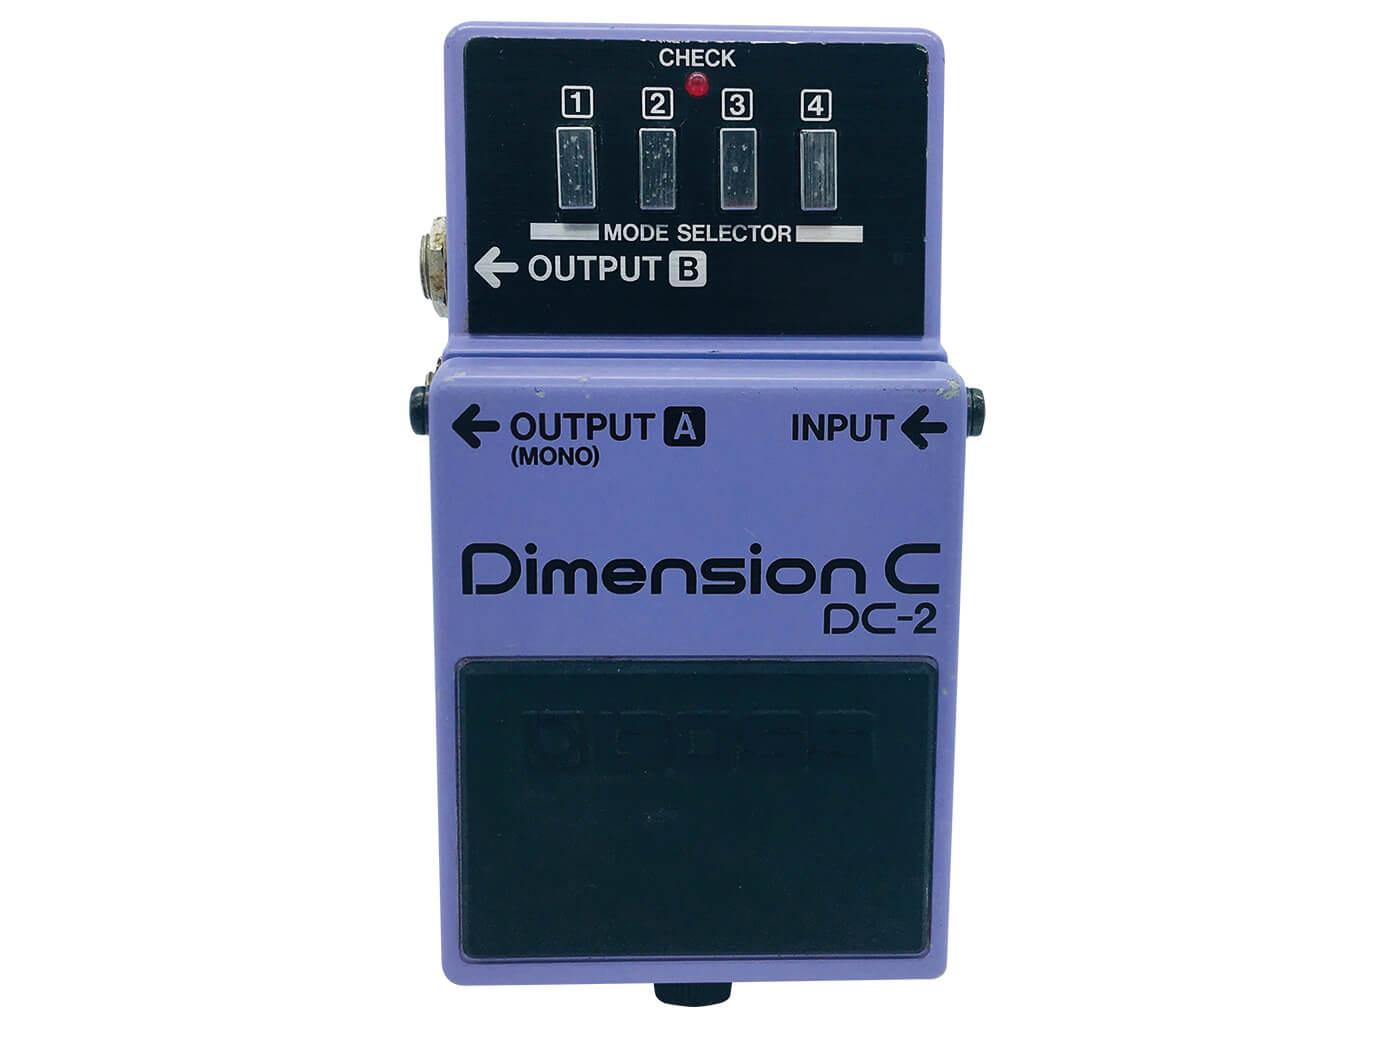 boss dc-2 dimension c